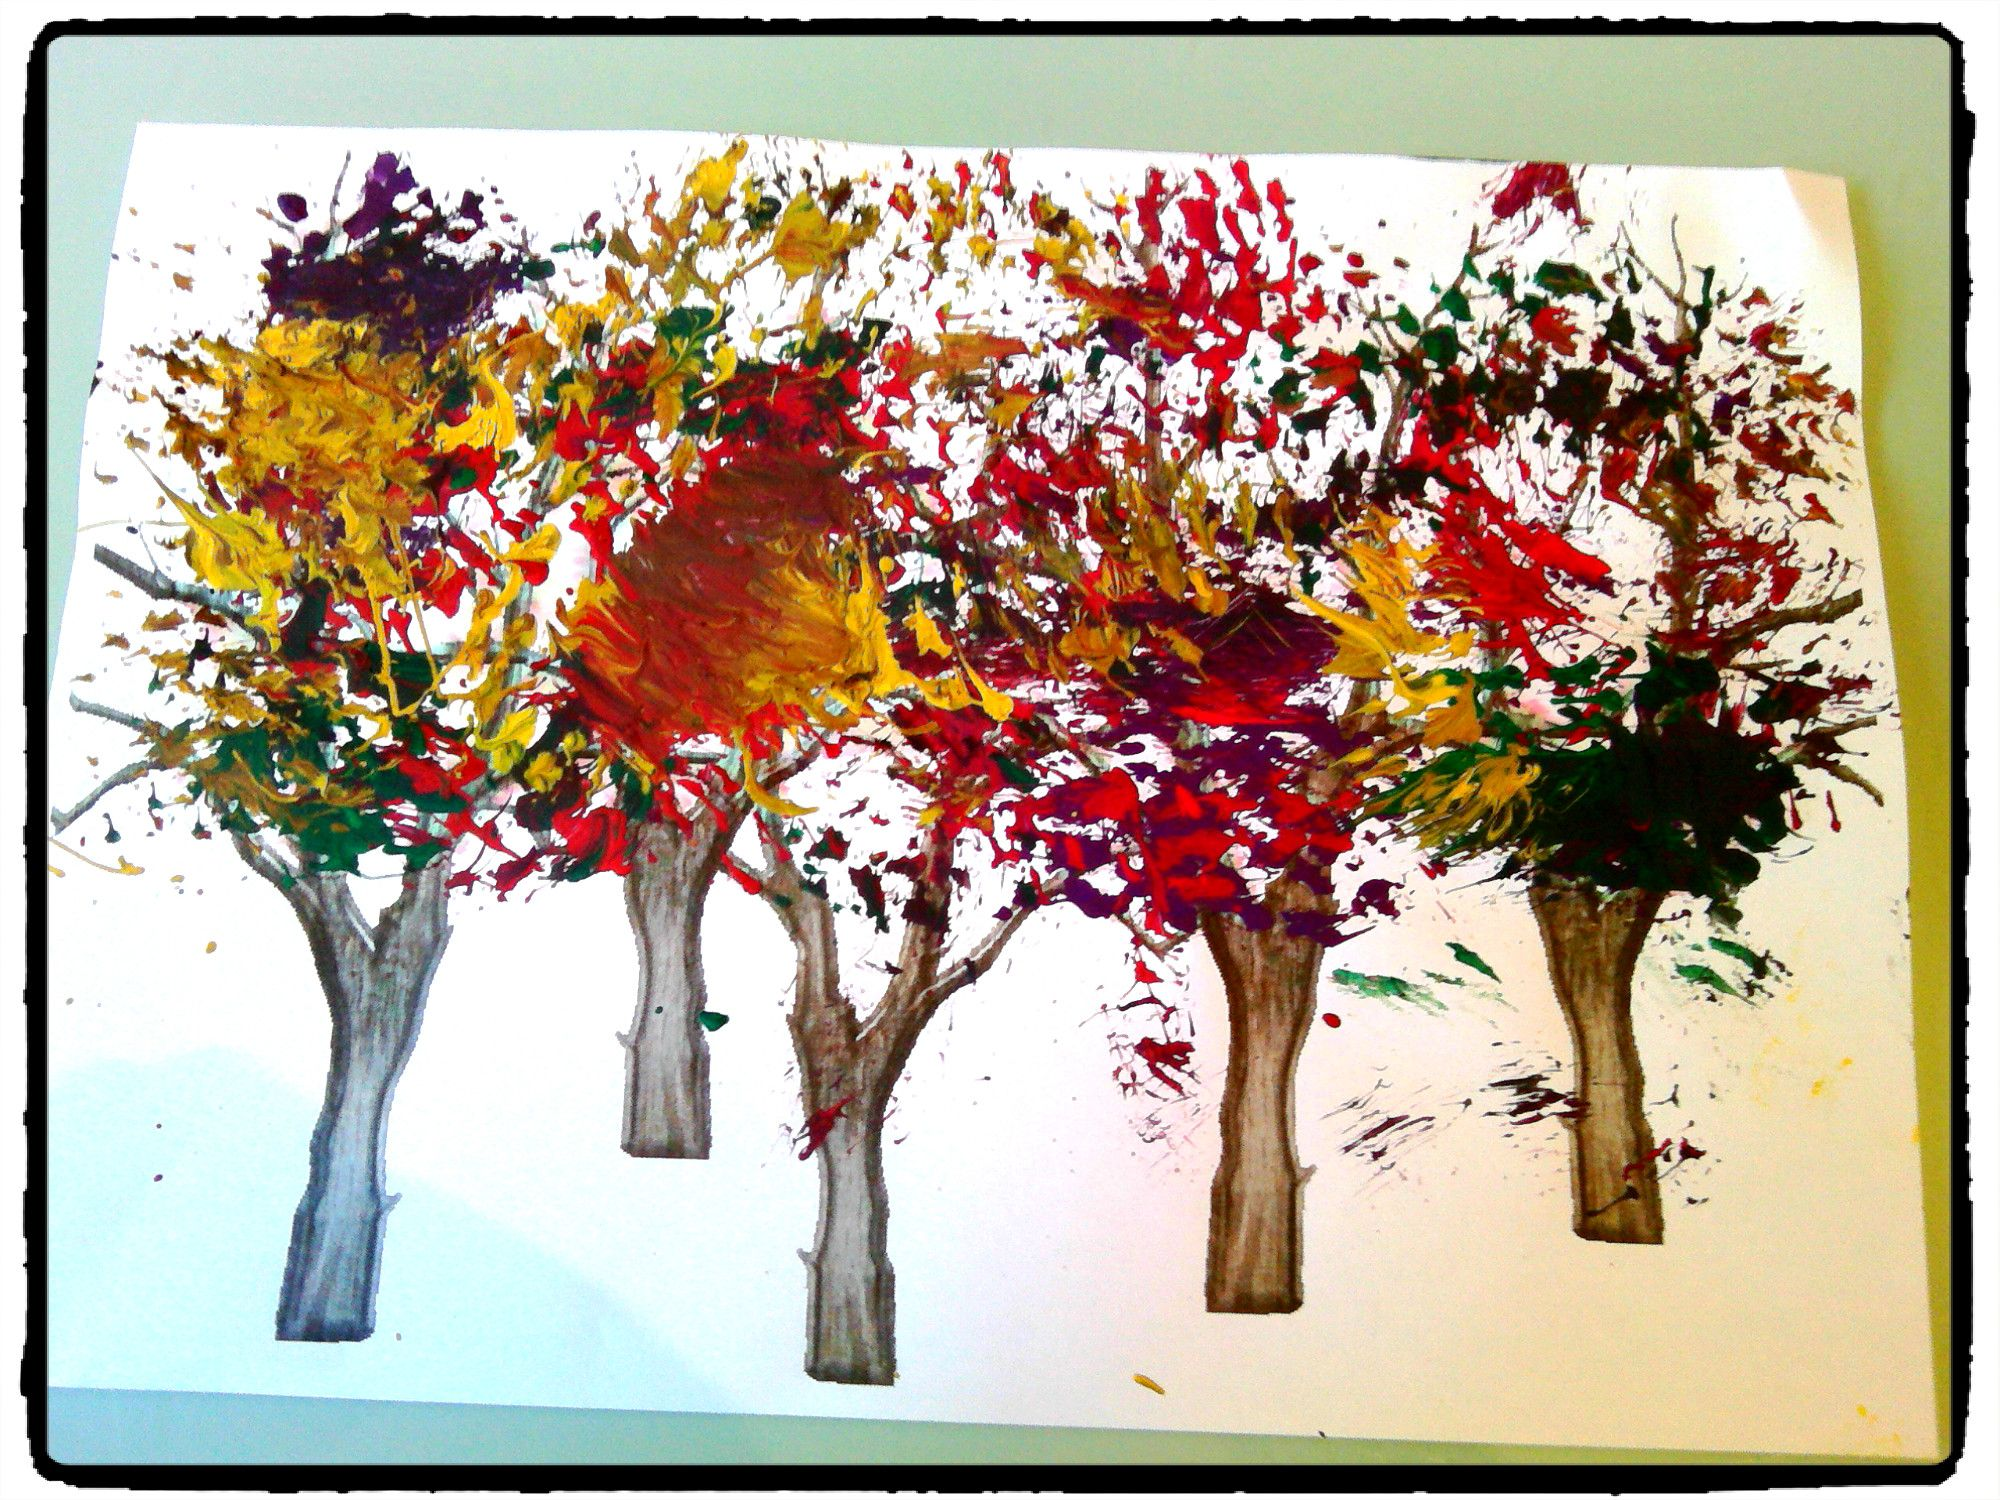 peindre une foret en automne arbre peinture la brosse bricolage enfant dessin pinterest. Black Bedroom Furniture Sets. Home Design Ideas